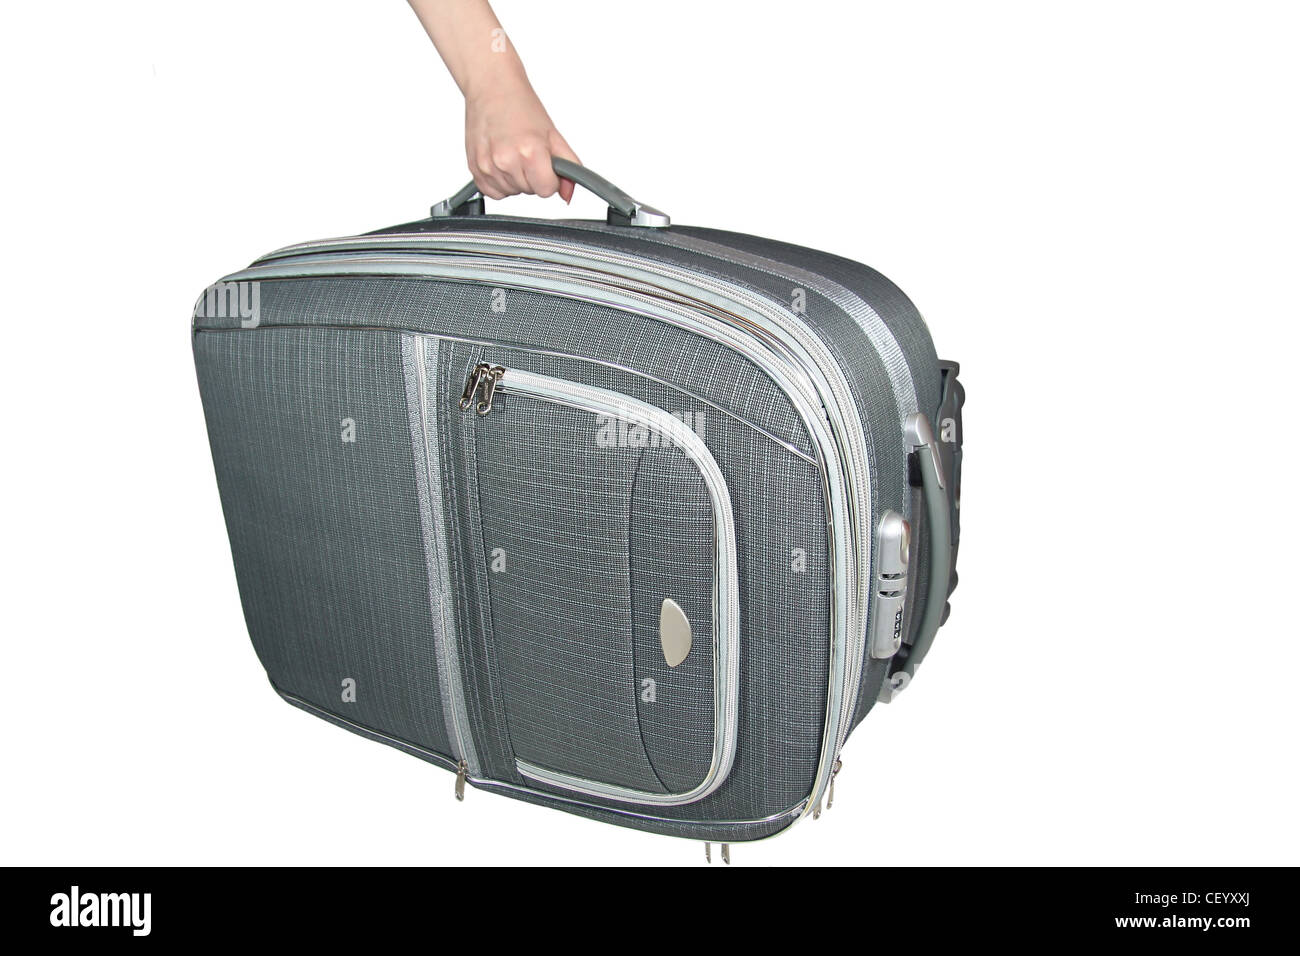 travel suitcase bag - Stock Image